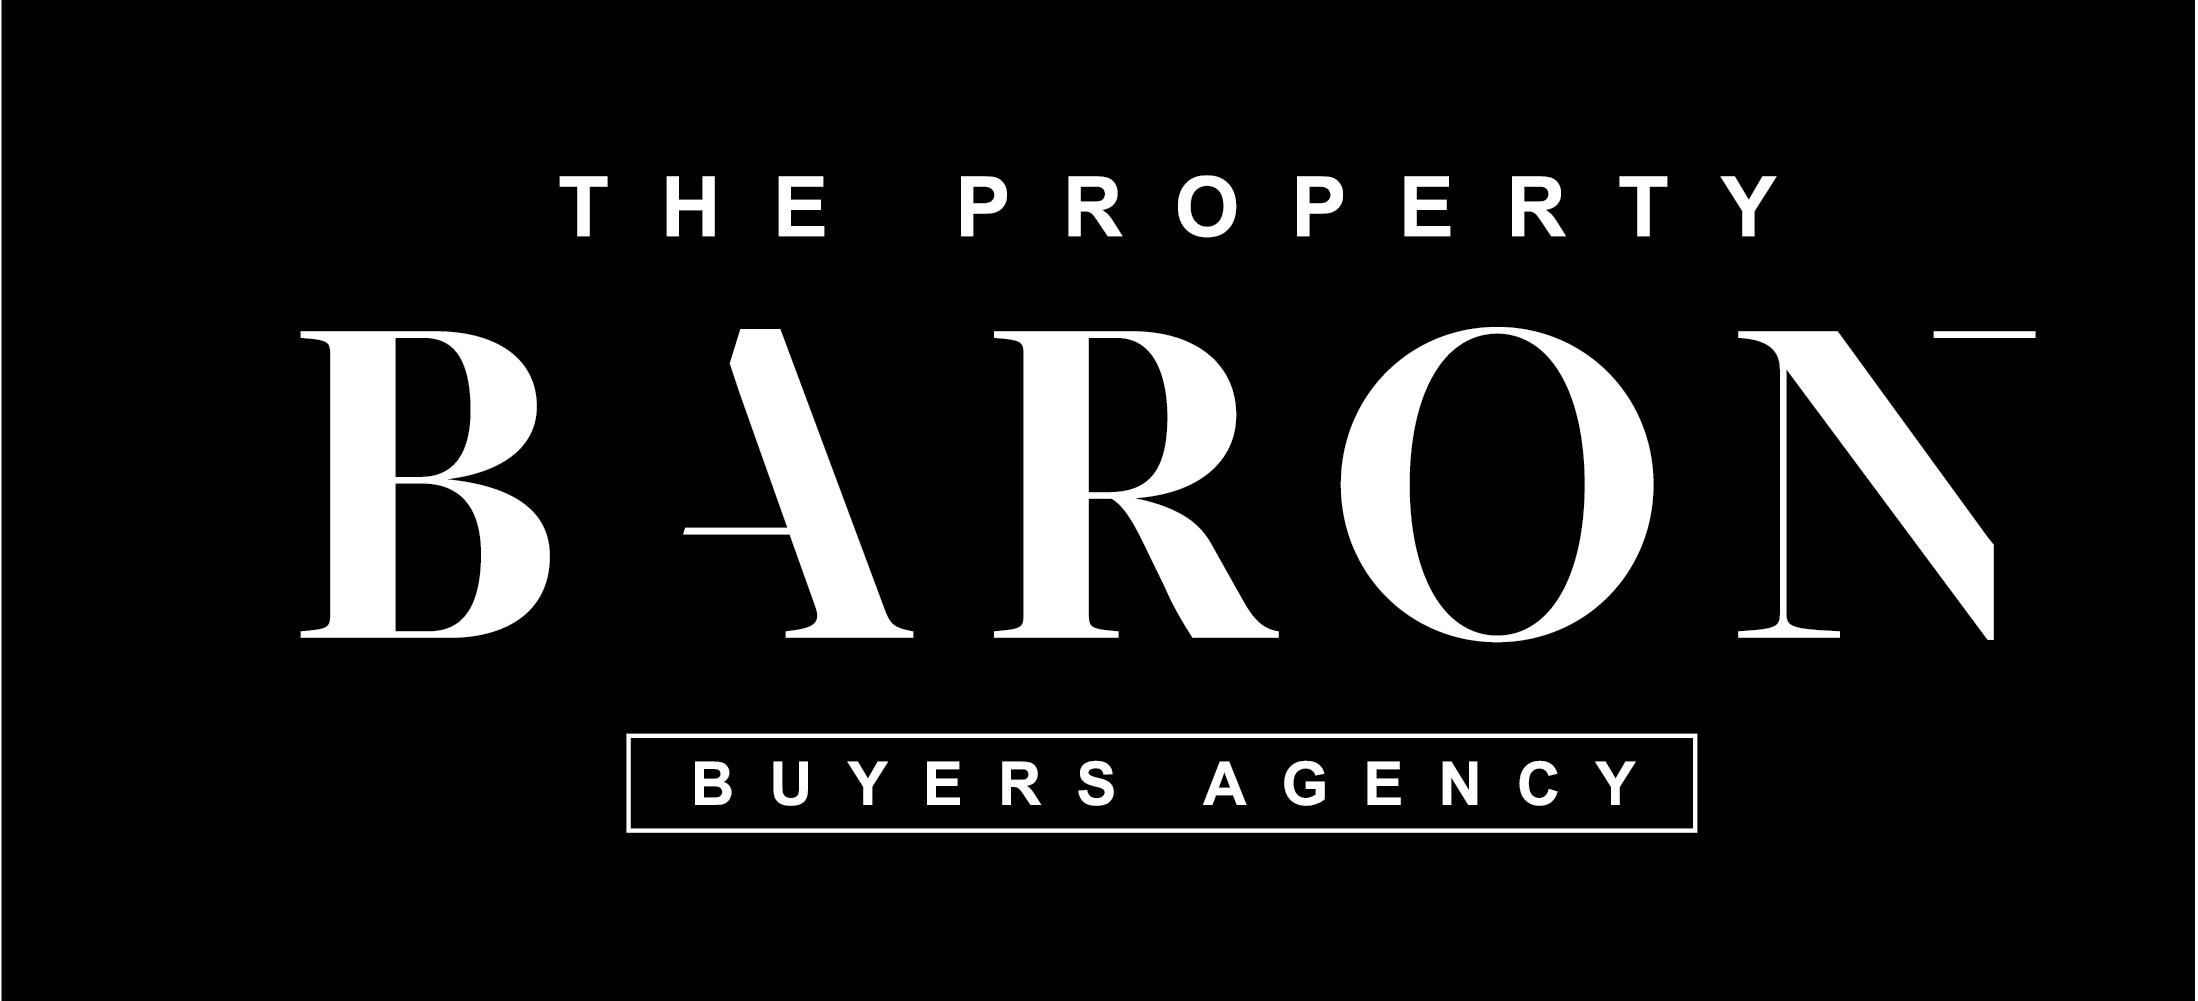 The Property Baron